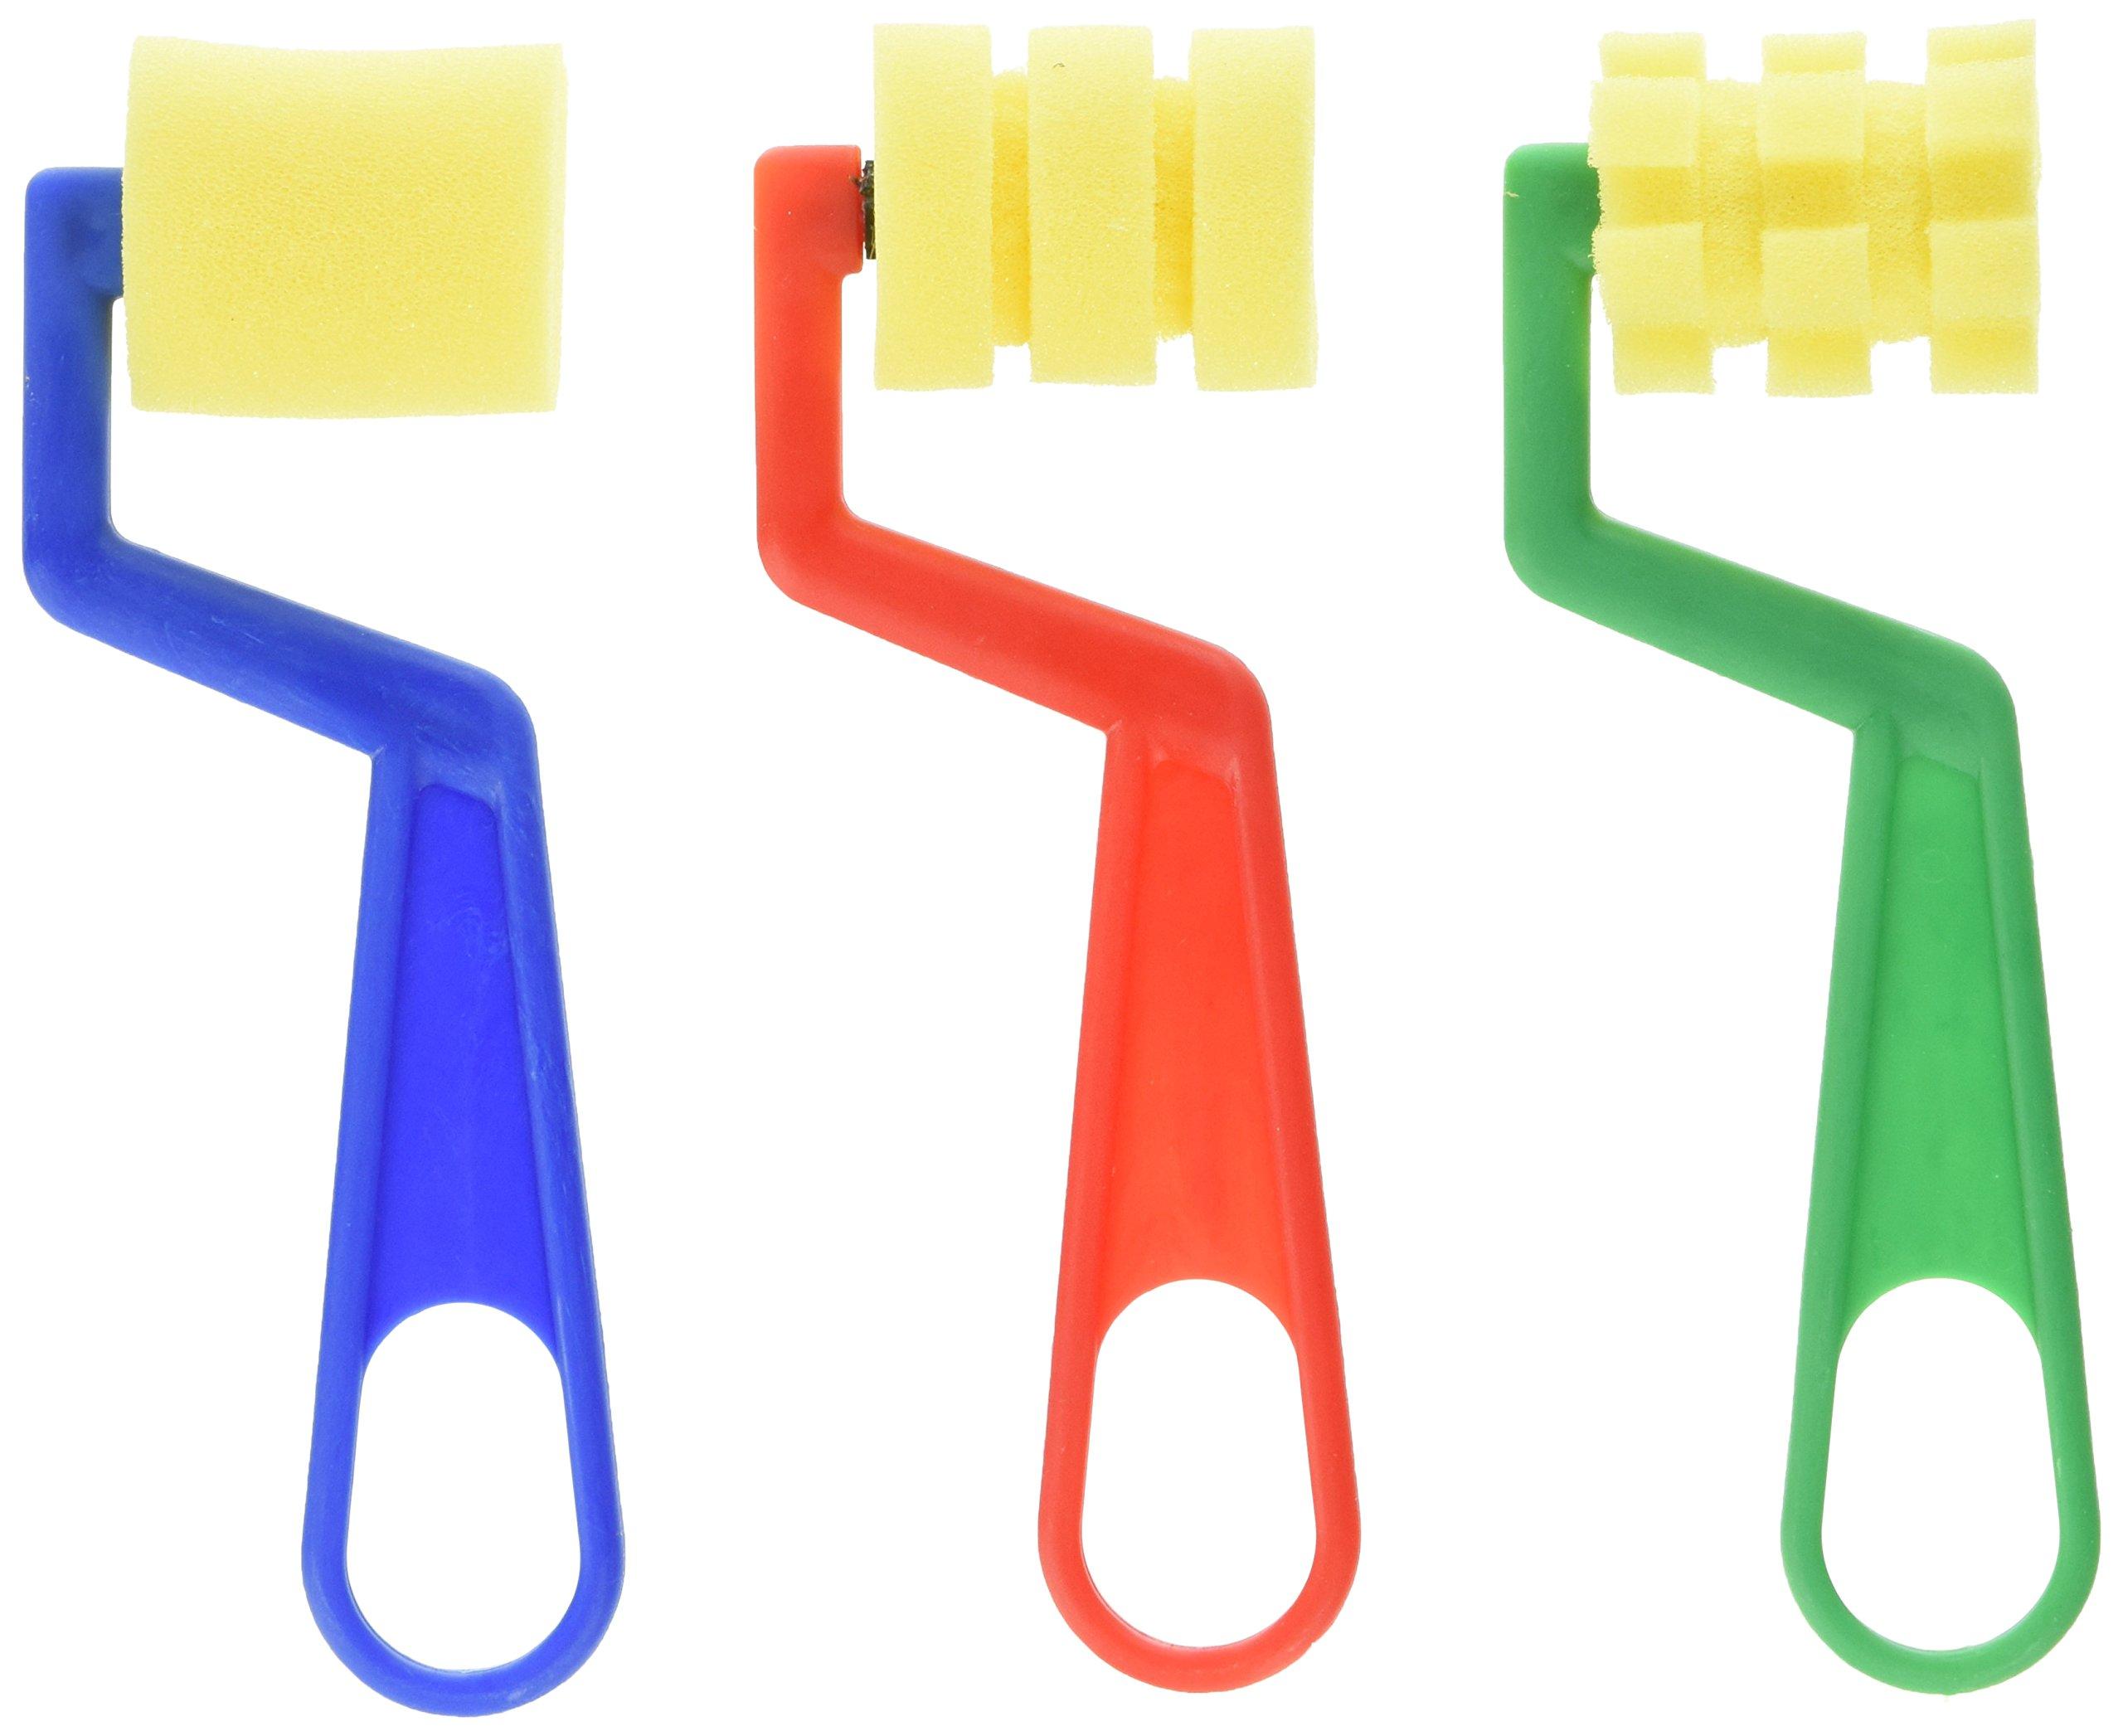 School Smart Small Foam Design Rollers - 1 1/2 inch - Set of 12 - Assorted Colors by School Smart